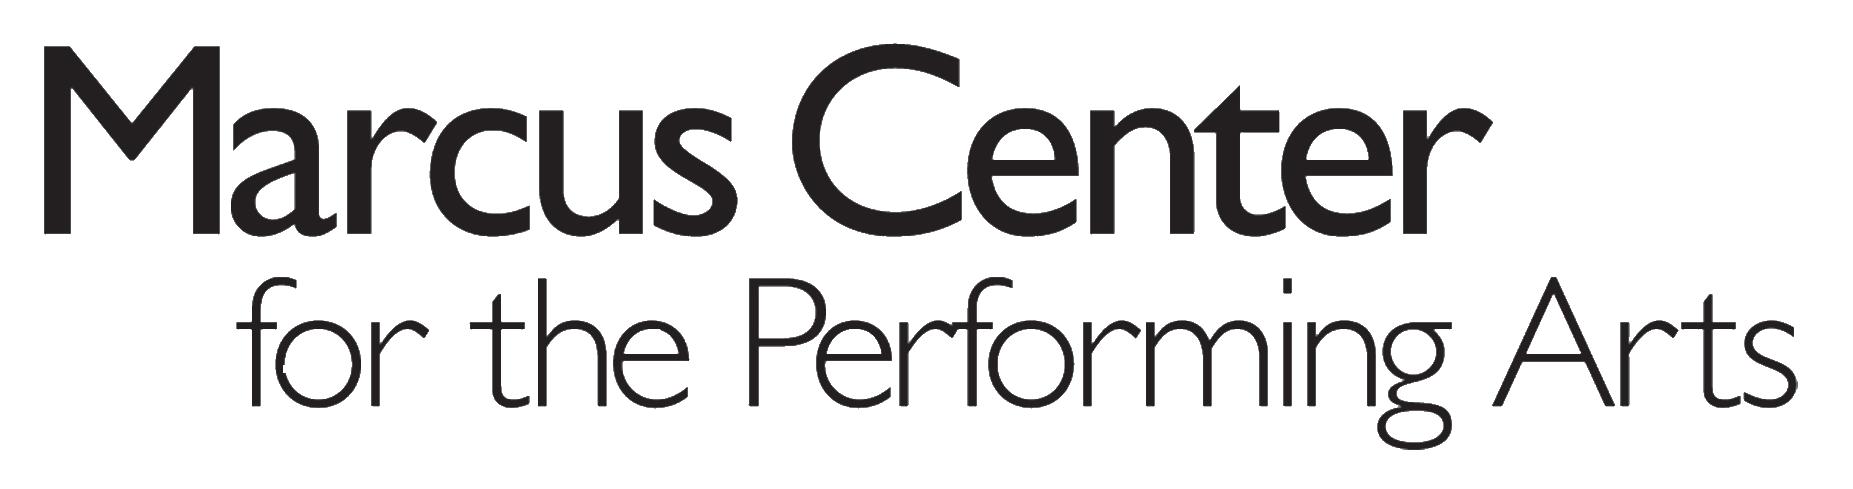 marcus-center-logo_1_orig.png